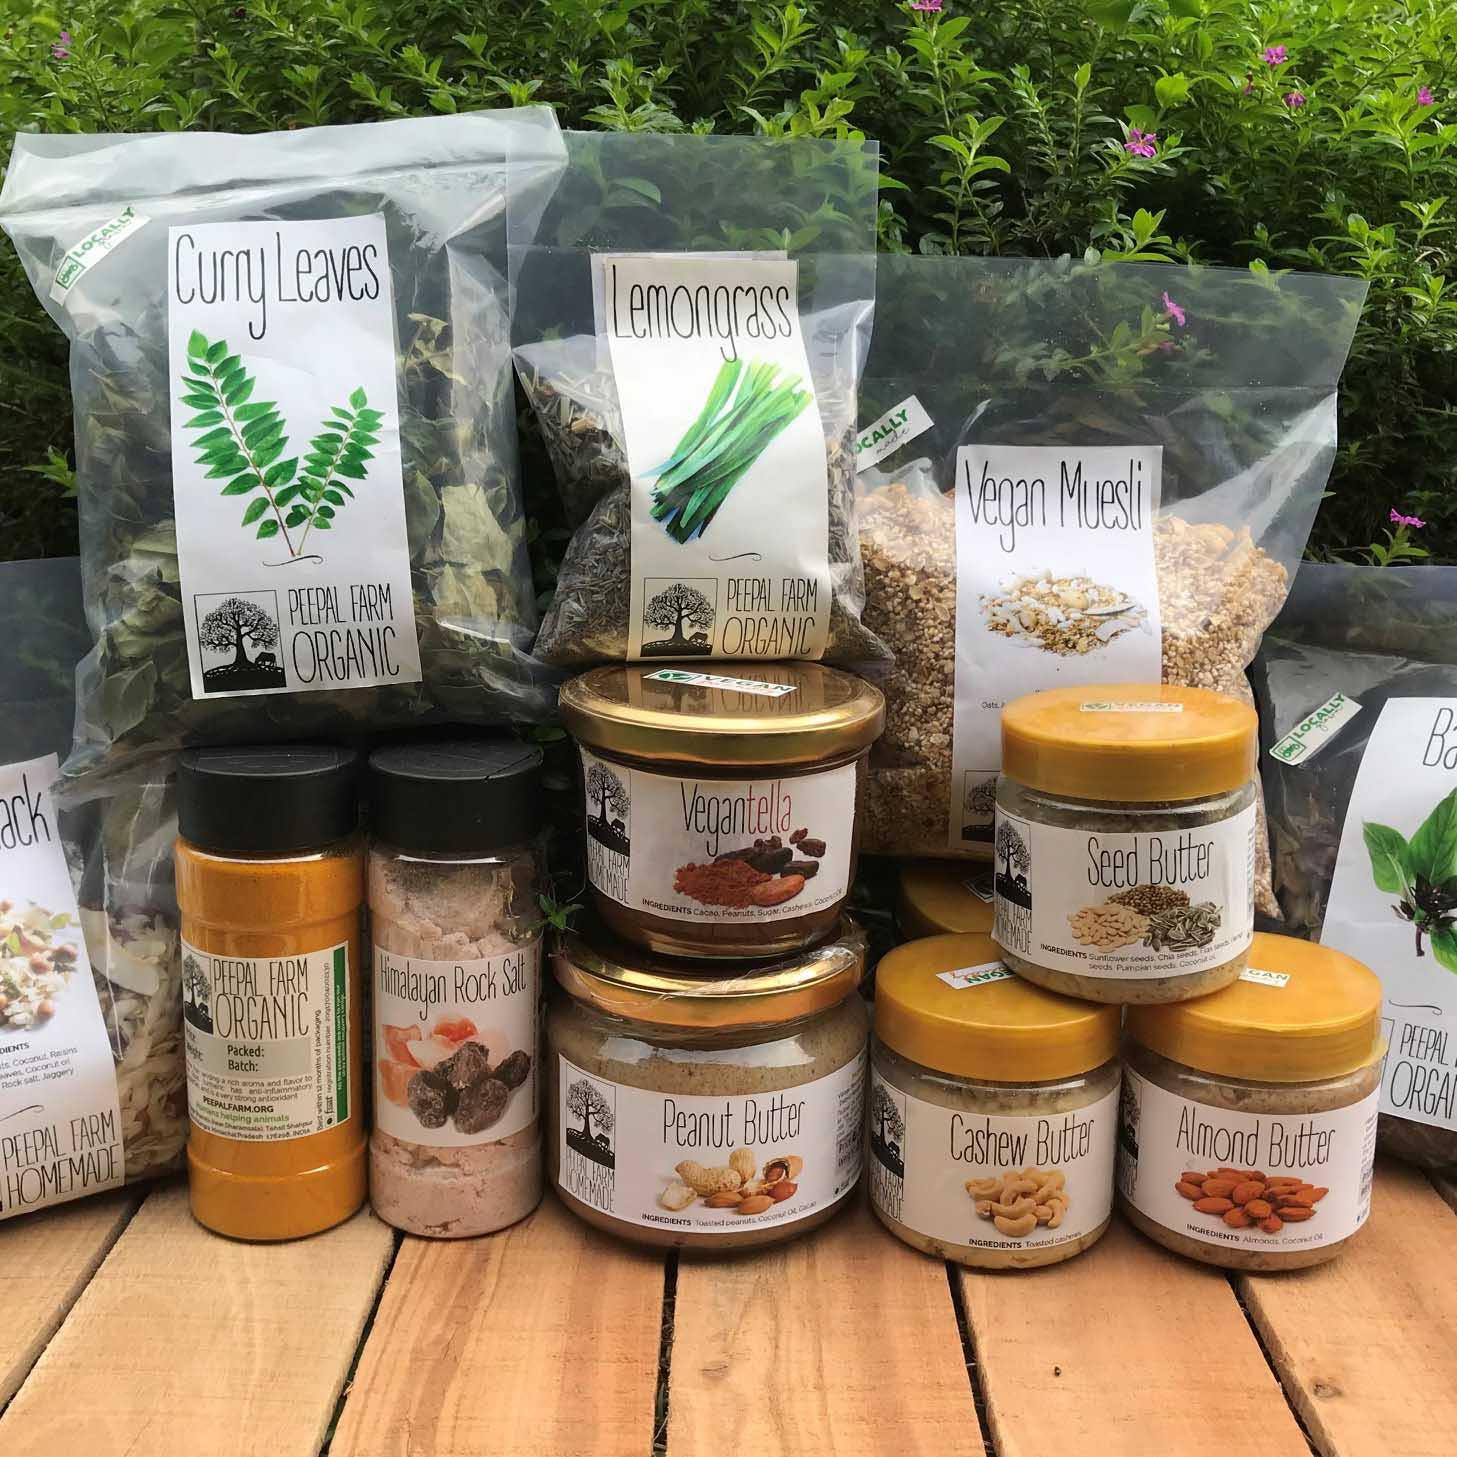 Buy Organic & Vegan Products From Peepal Farm | LBB